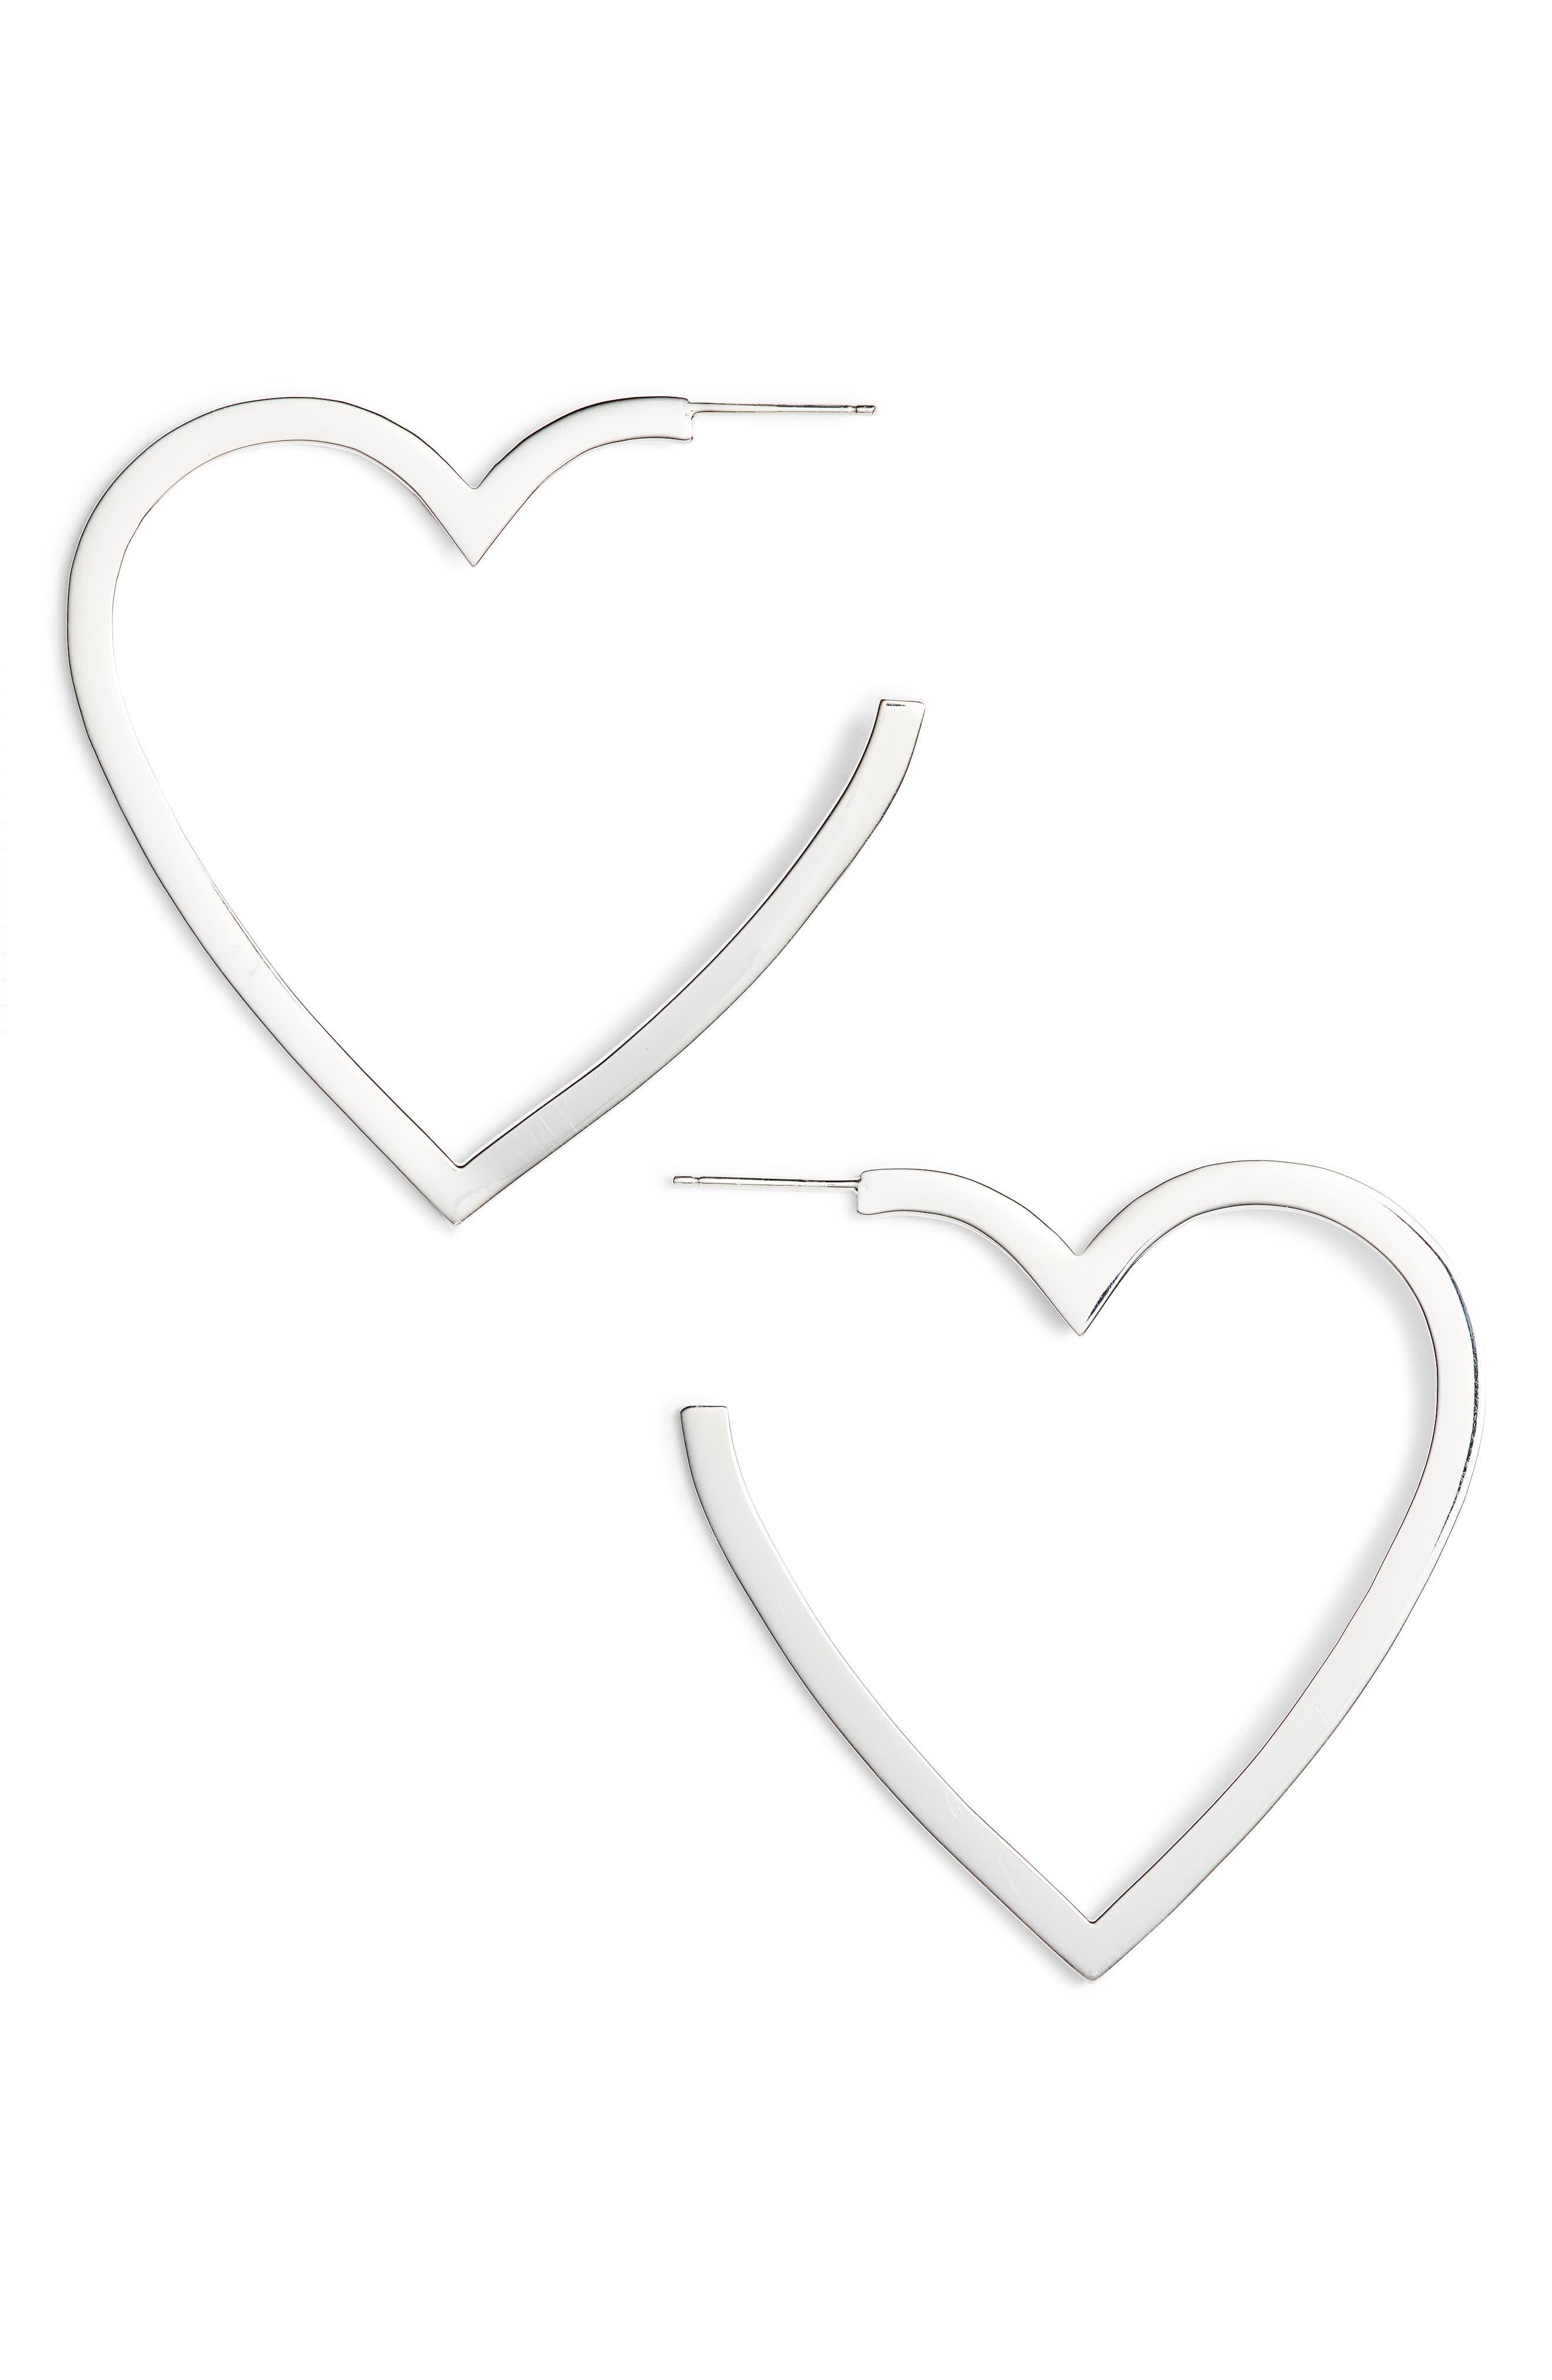 Larissa Medium Open Heart Earrings,                             Main thumbnail 1, color,                             STERLING SILVER